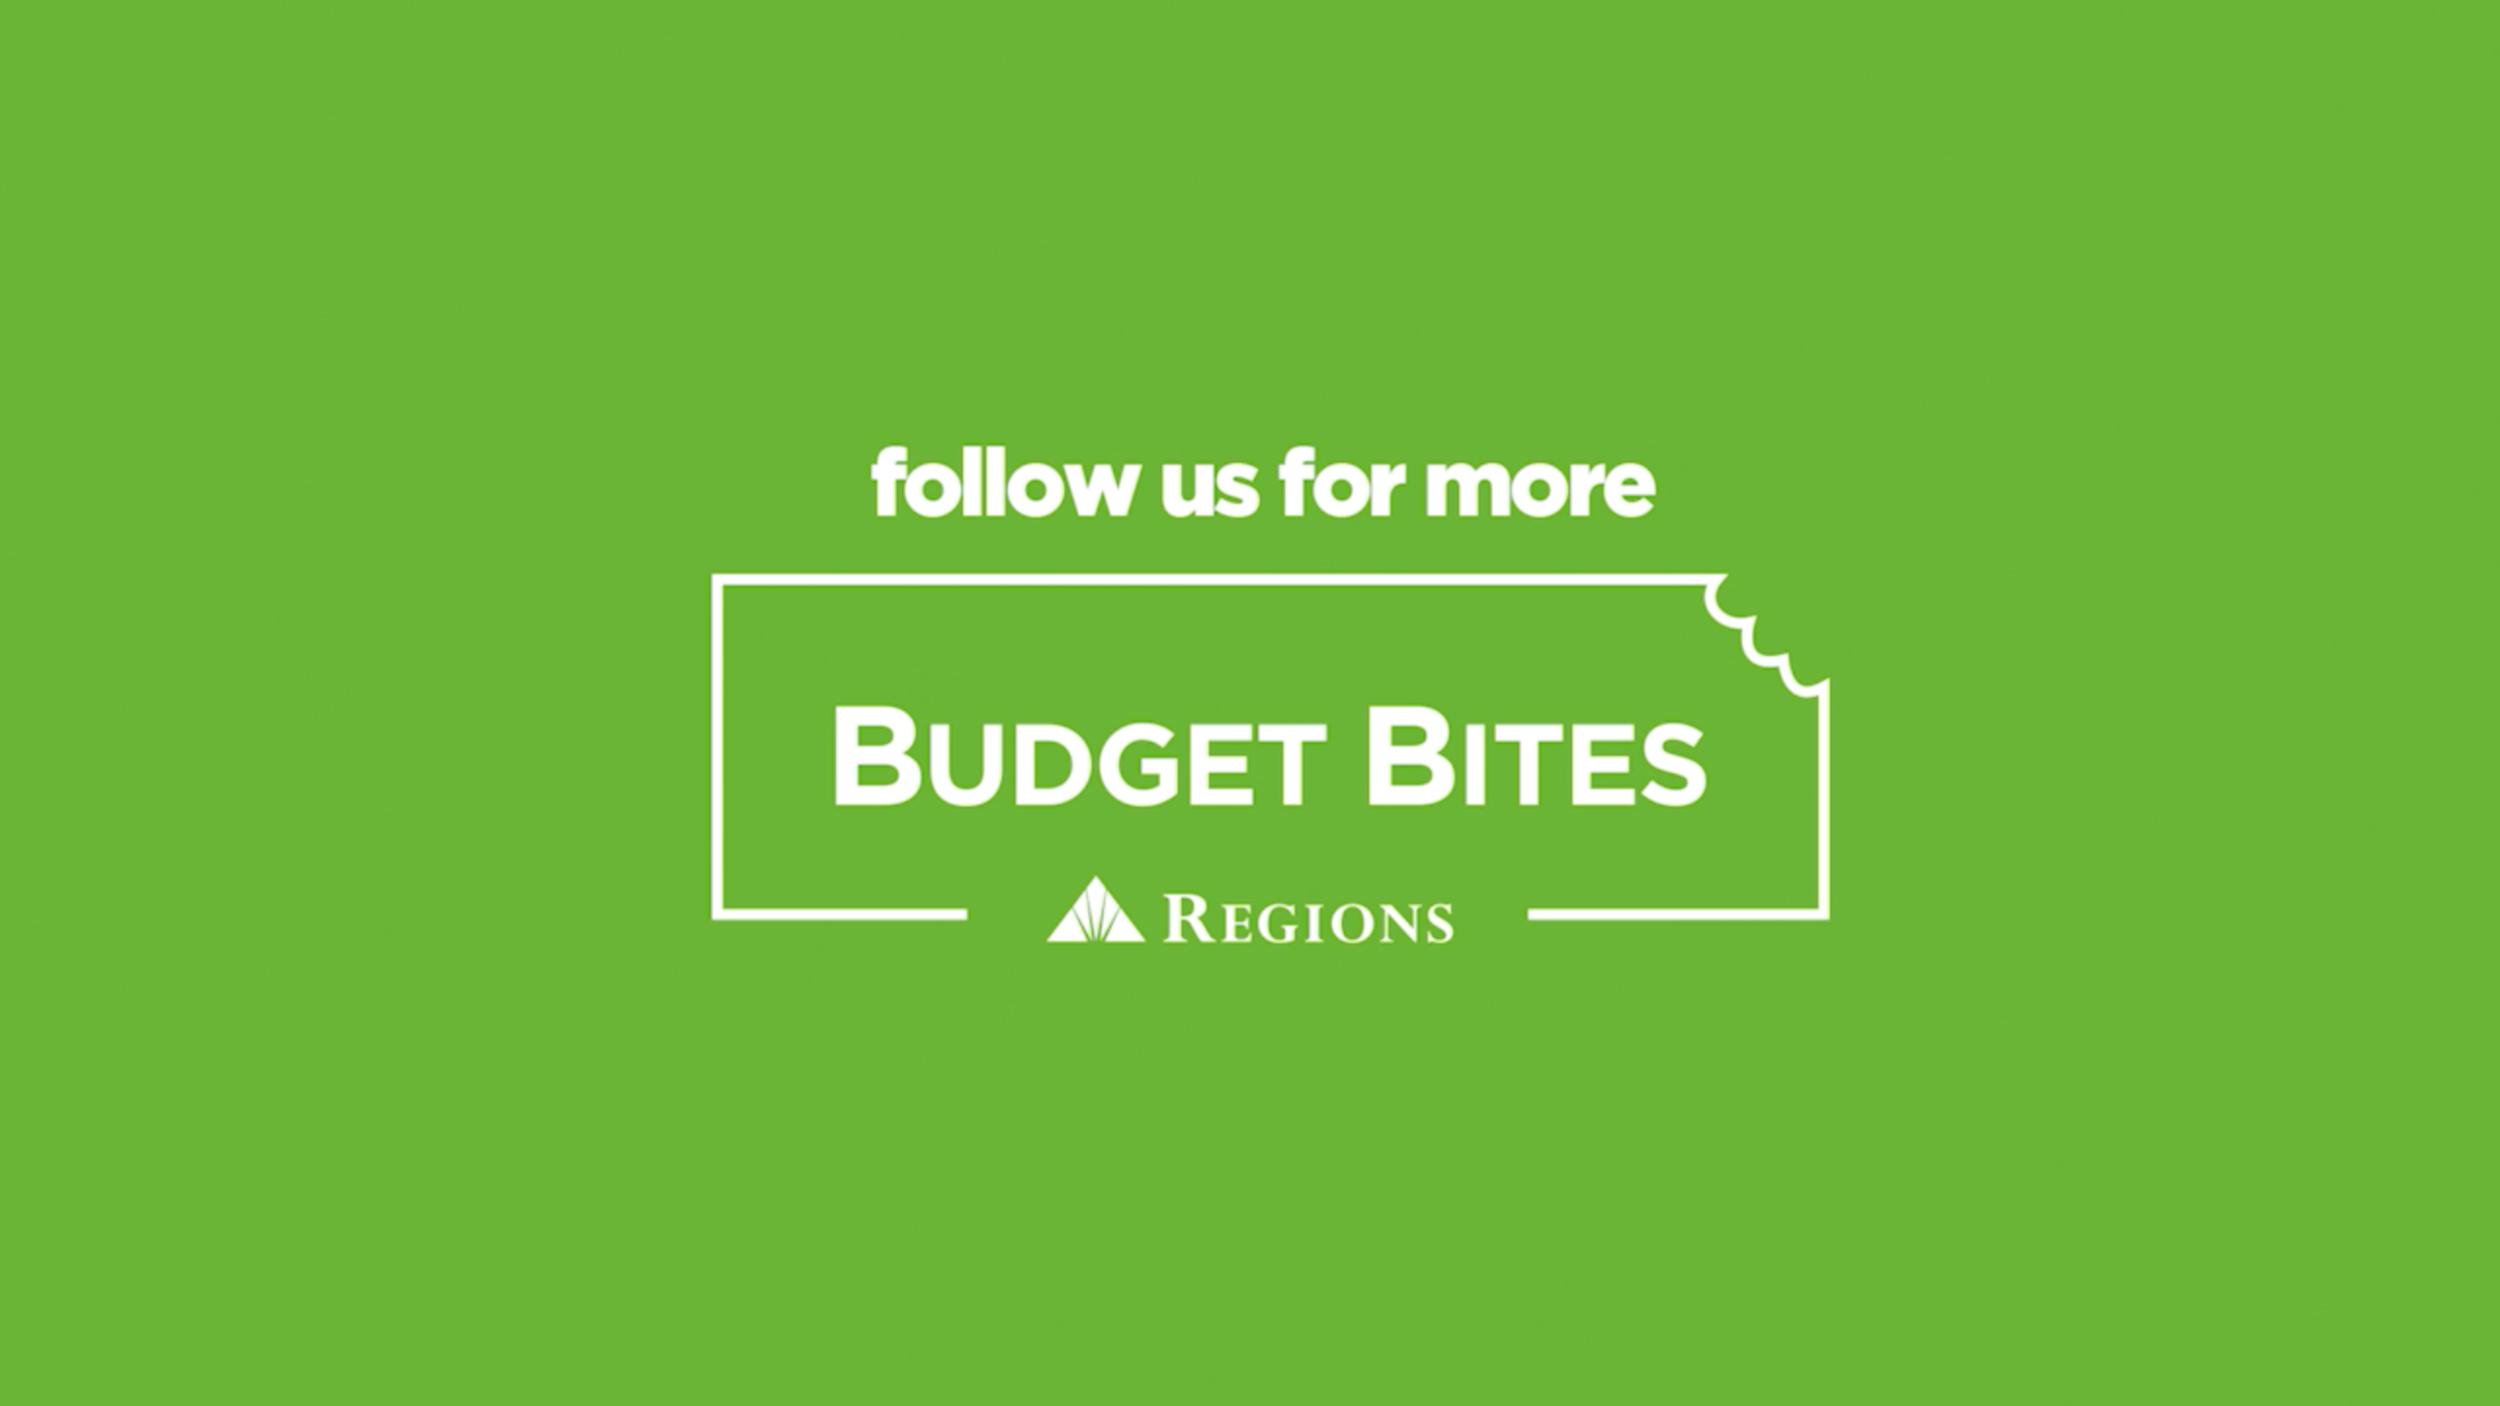 "<a href=""https://www.carlosdevarona.com/regions-bank-three-mug-meals"">REGIONS BANK - THREE MUG MEALS</a>"